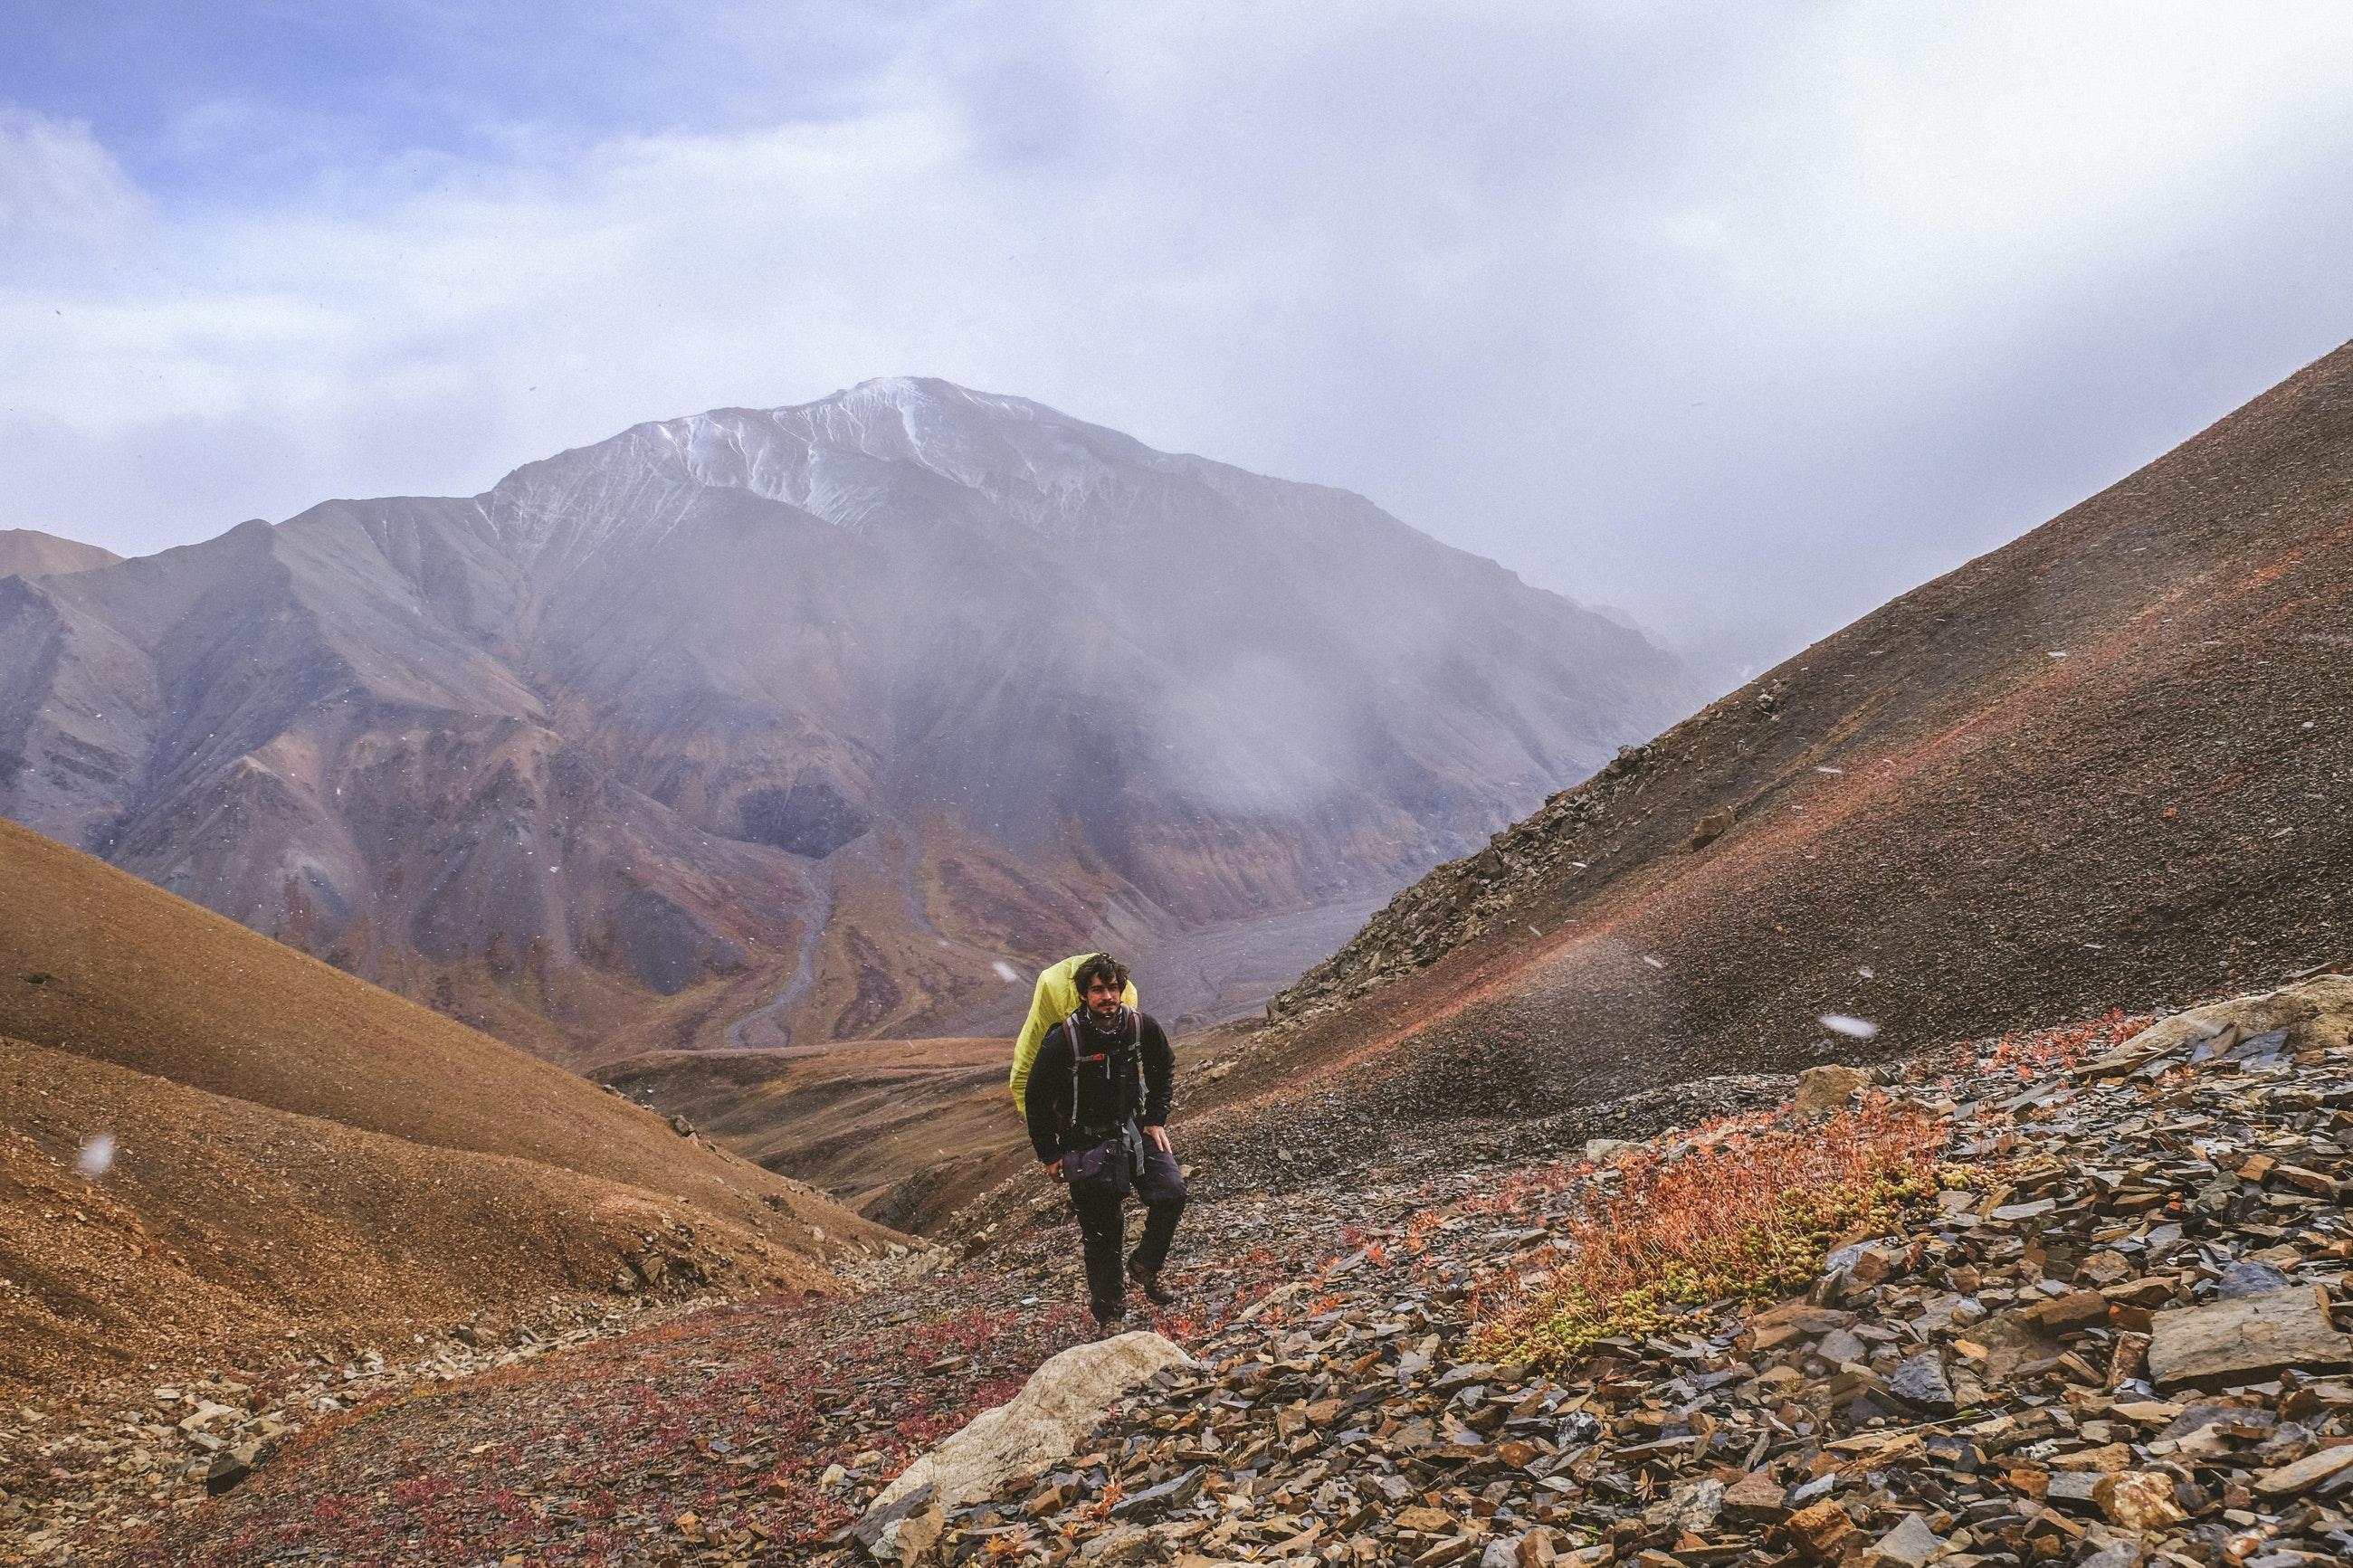 Looking back - Denali National Park